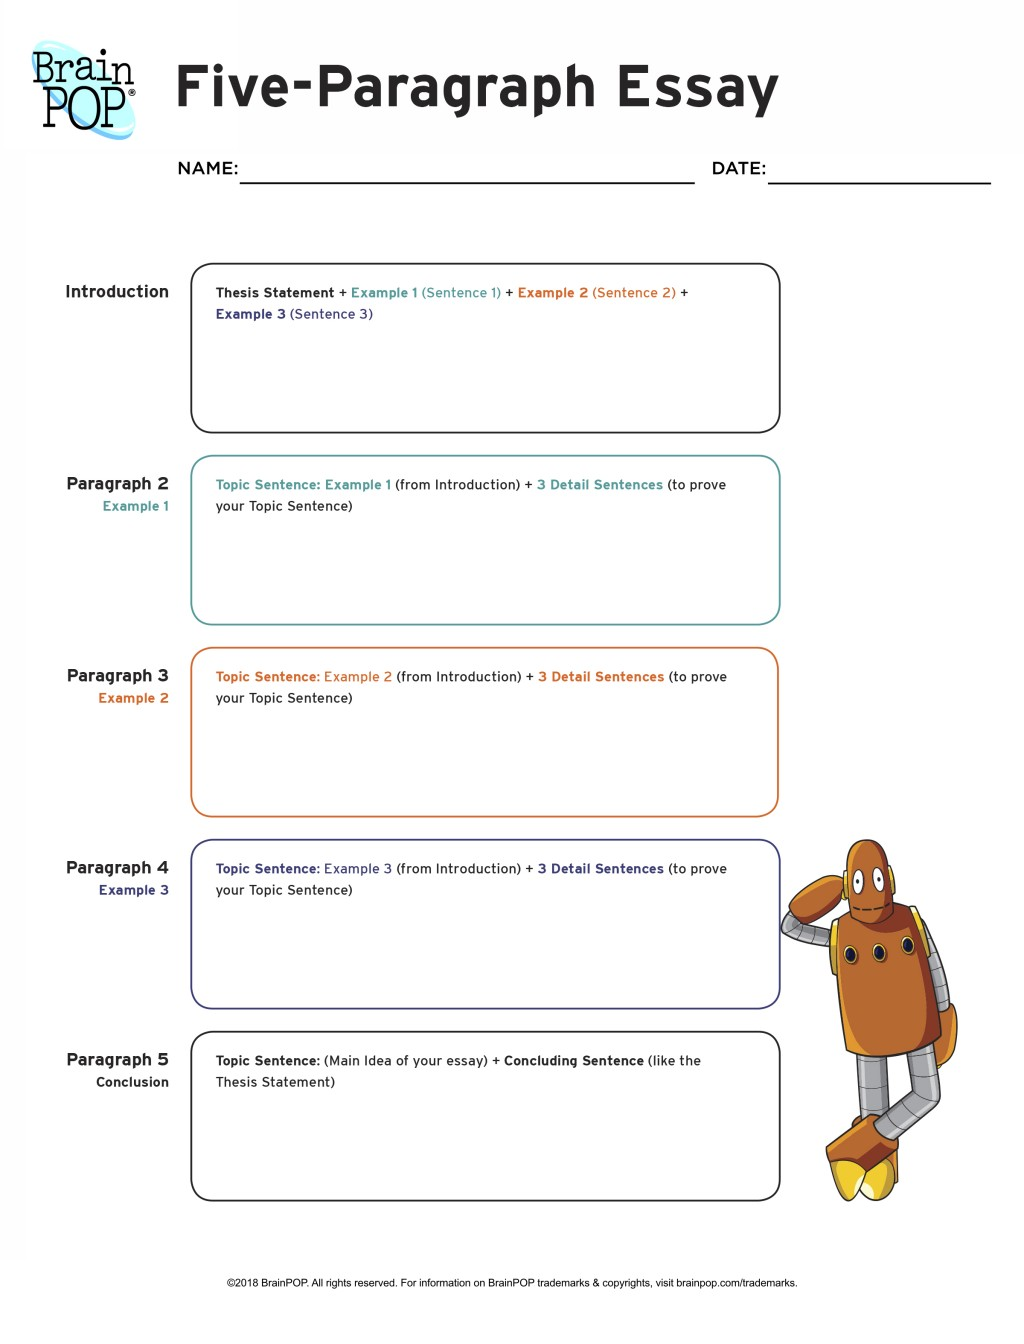 001 Essay Example Five Paragraph Graphic Wonderful Organizer 5 Middle School Pdf Organizer-hamburger Large